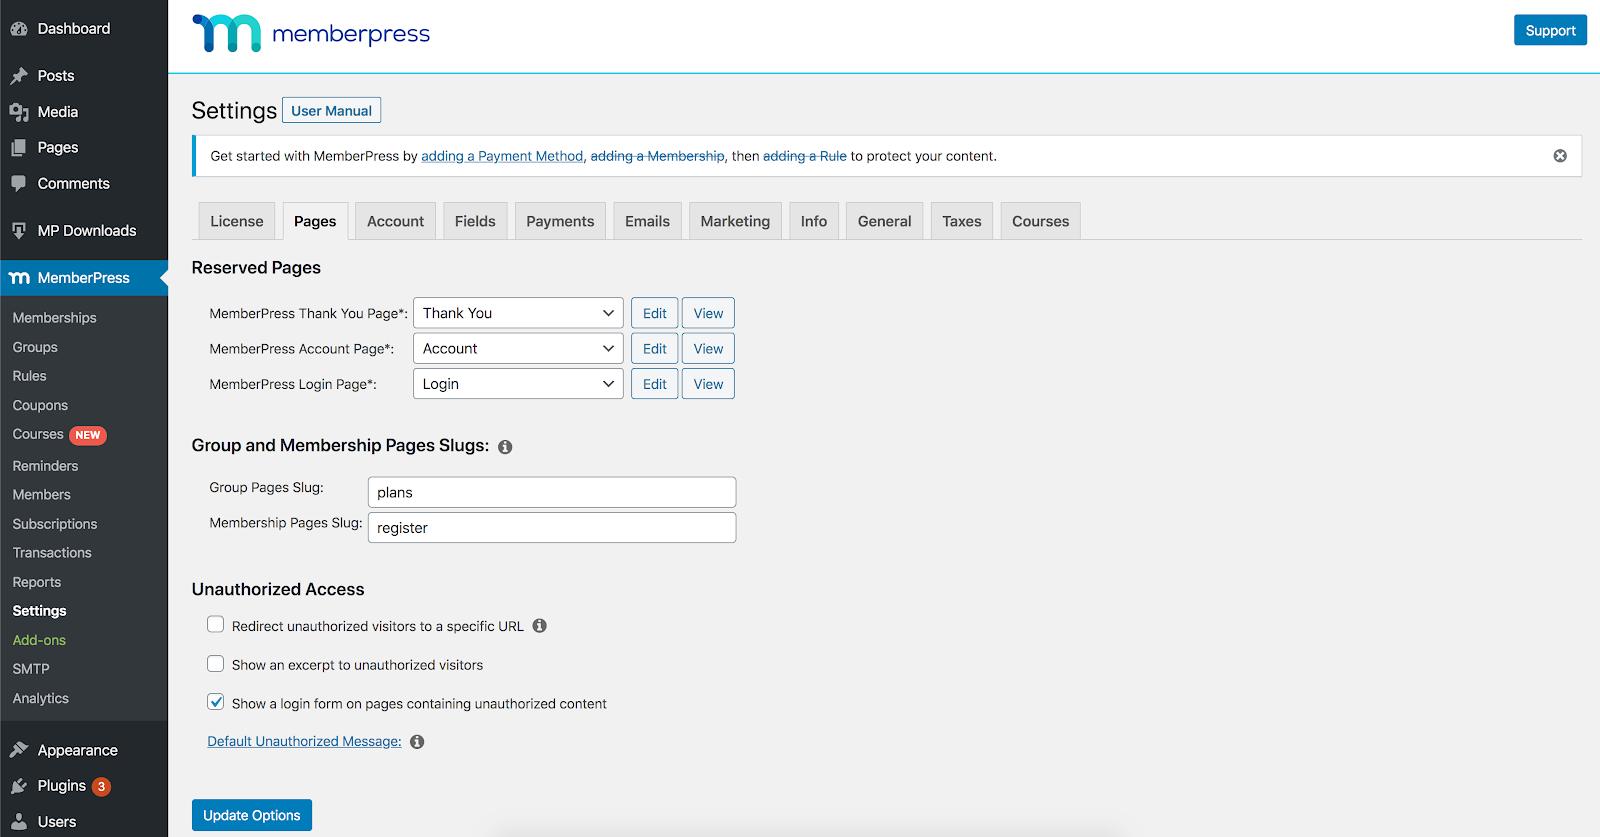 unauthorized access settings